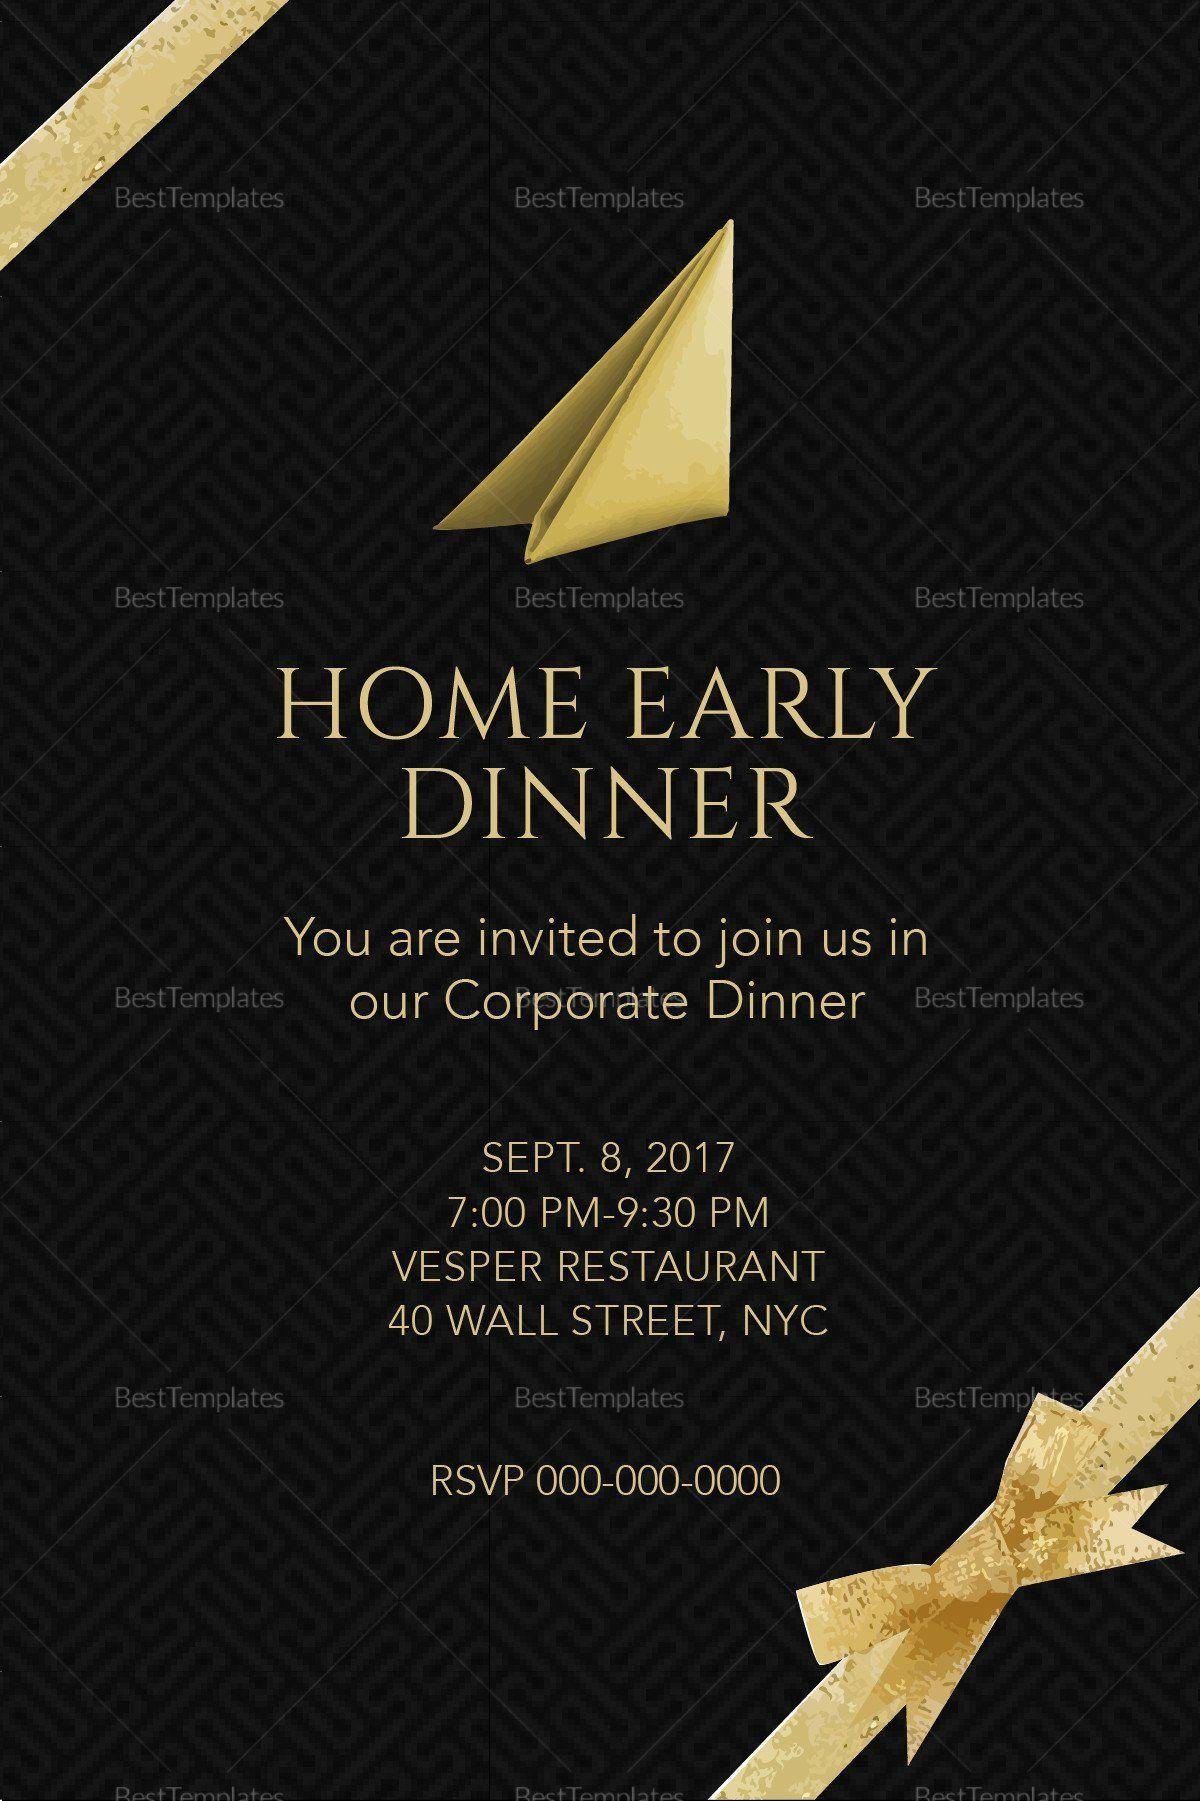 Dinner Invitation Template Word Fresh Corporate Dinner Invitation